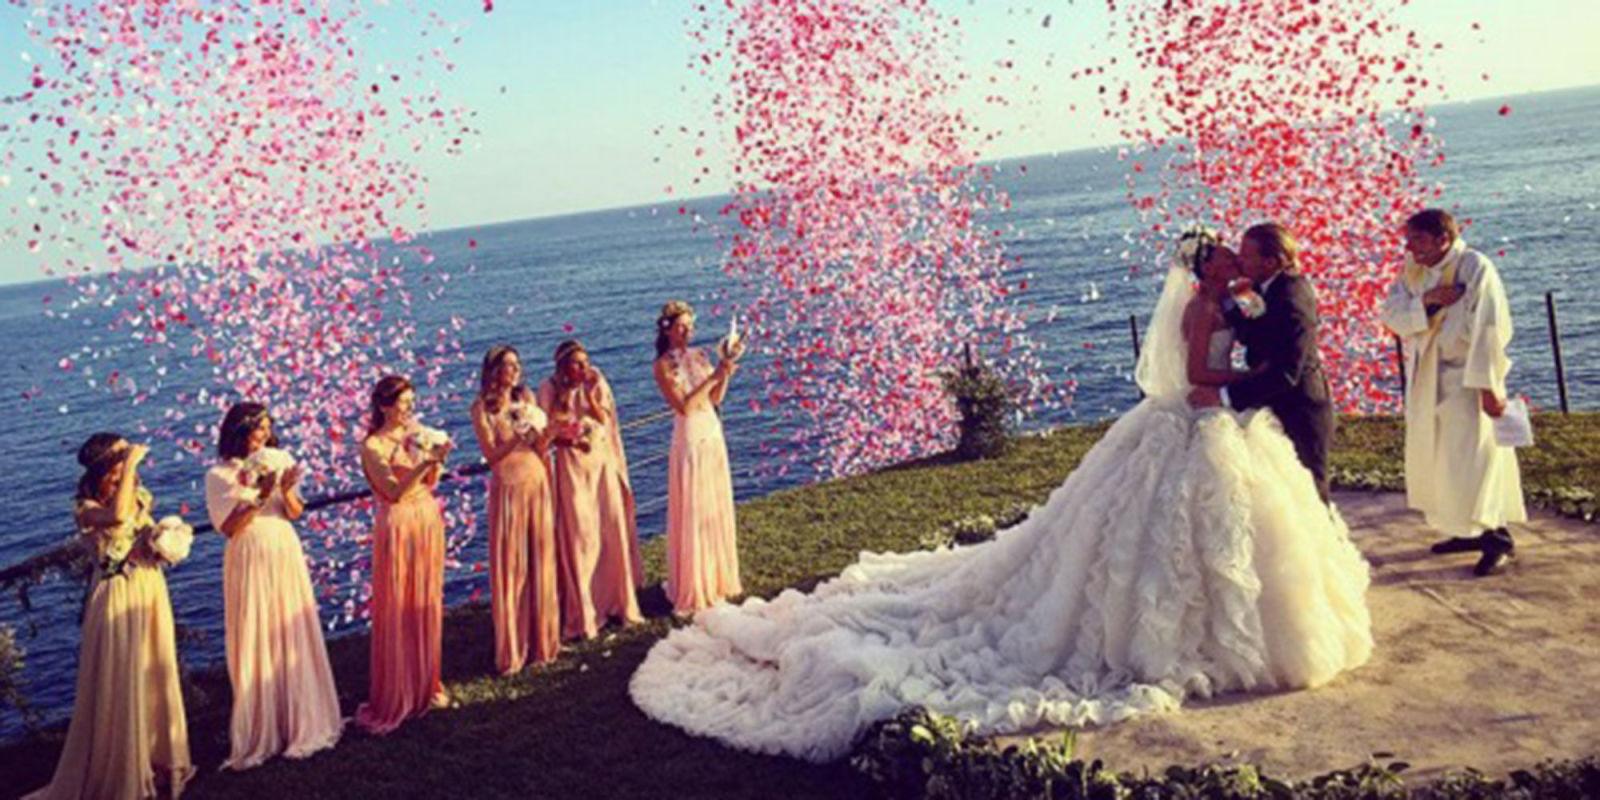 Giovanna Battaglia S Four Incredible Wedding Dresses